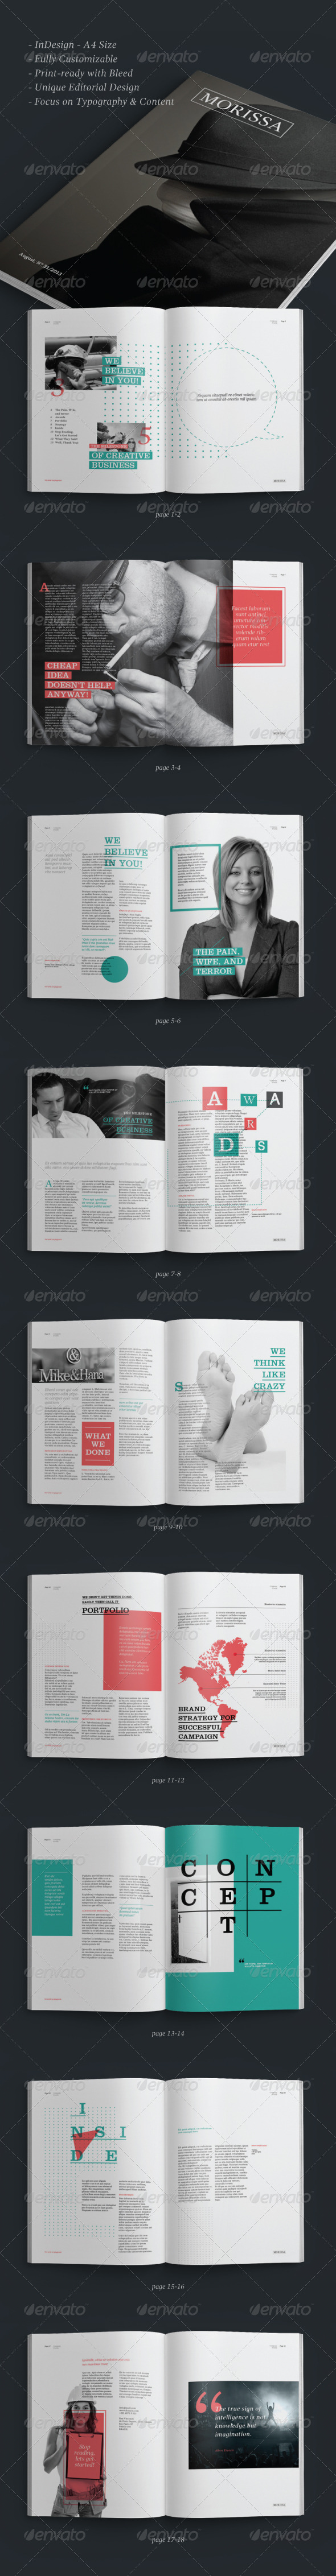 Minimal Multipurpose Brochure - Brochures Print Templates